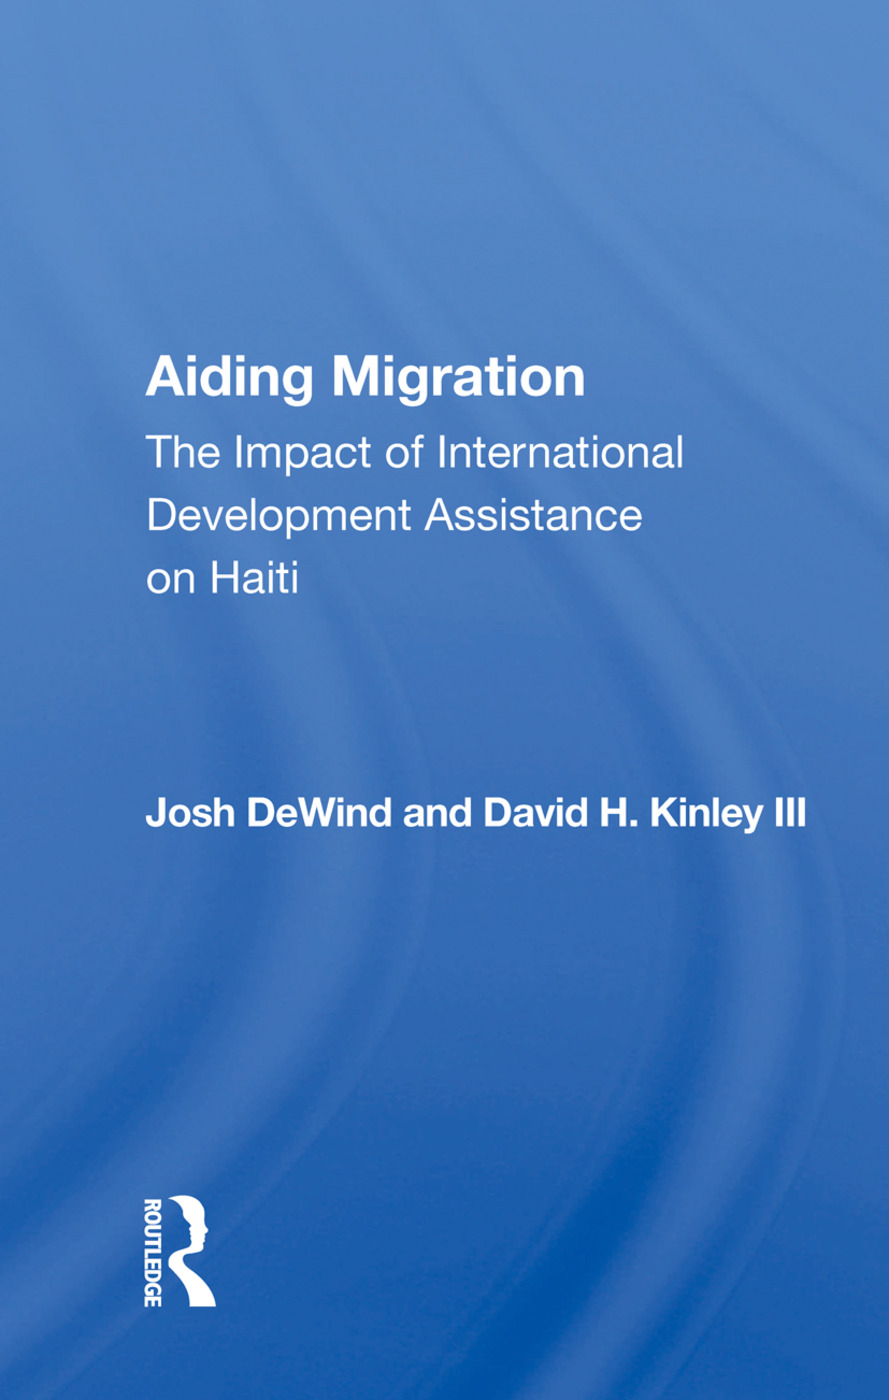 Aiding Migration: The Impact of International Development Assistance on Haiti, 1st Edition (Hardback) book cover